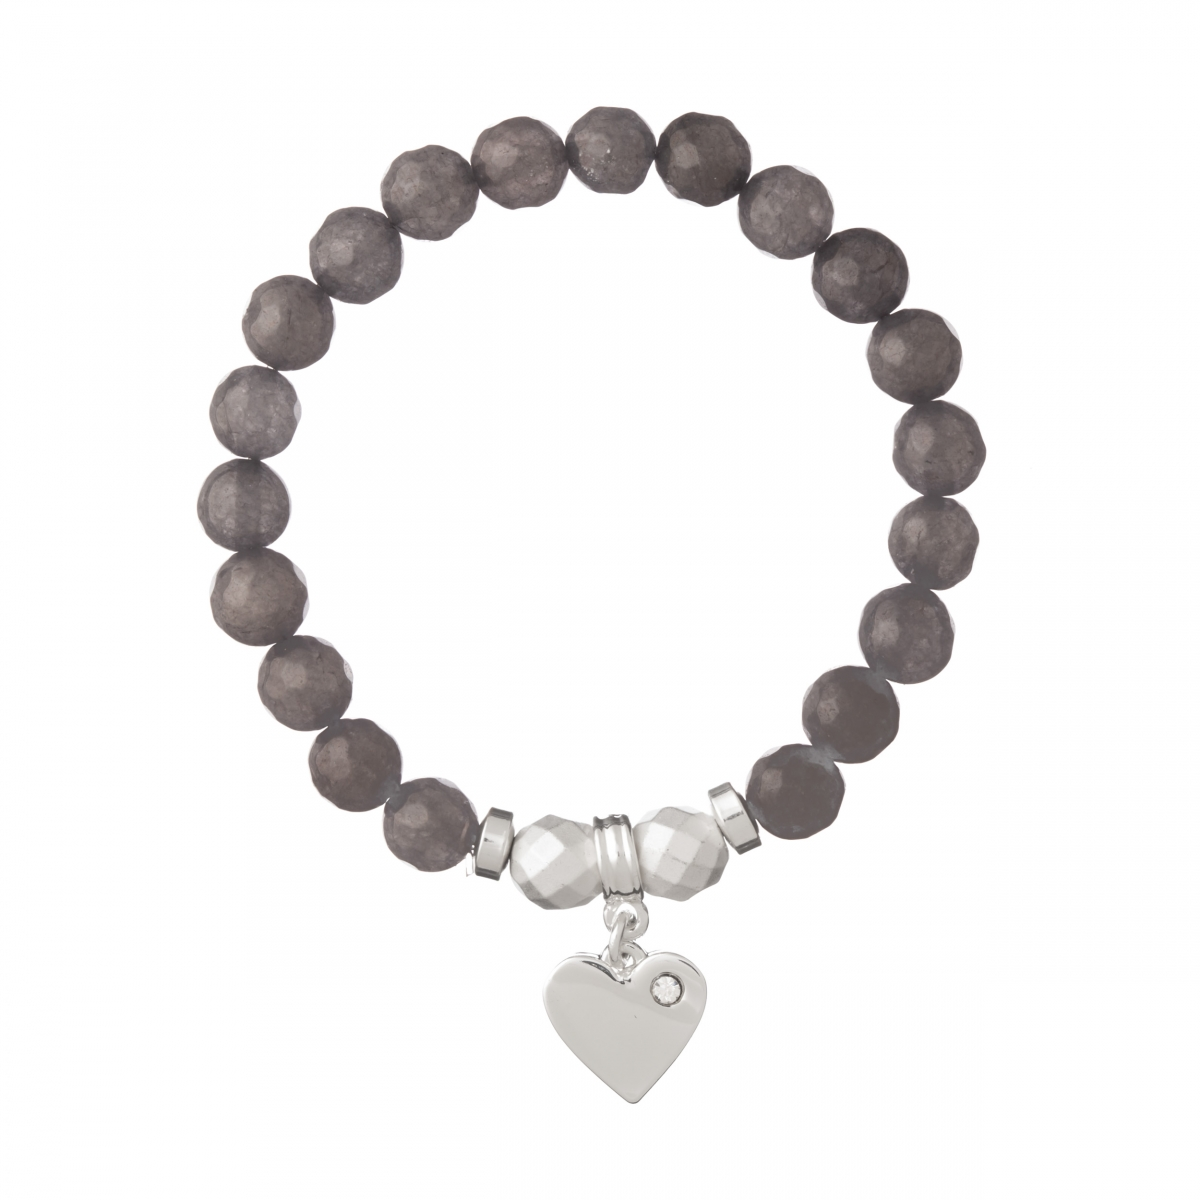 Náramok Mineral Facet Grey Jadeit Silver Heart